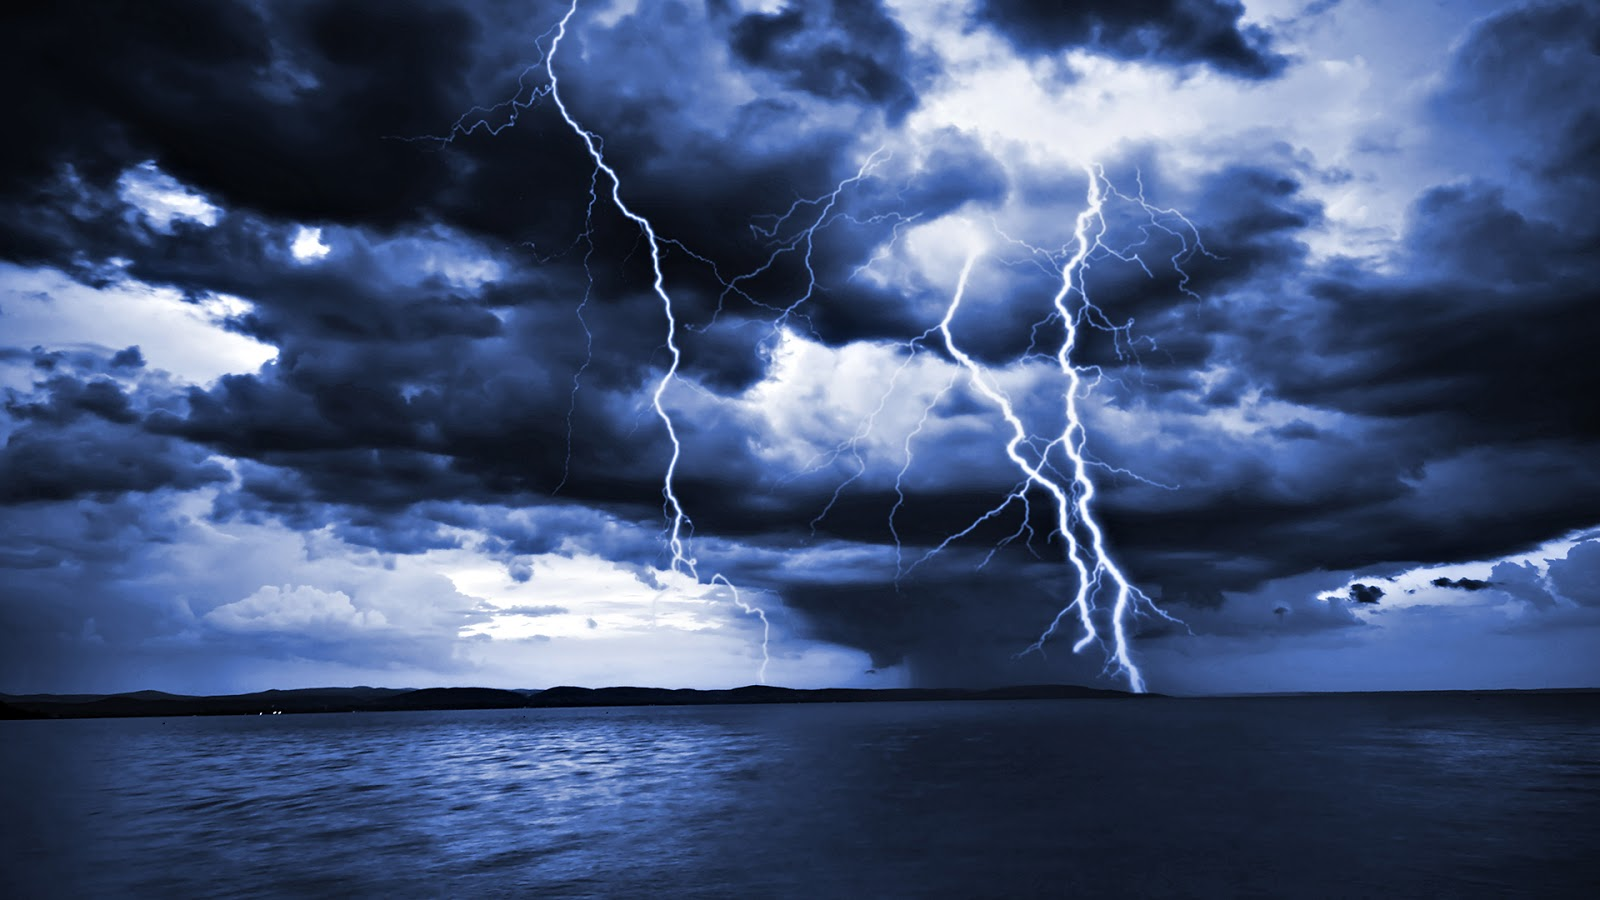 sky lightning wallpapers hd 1600x900